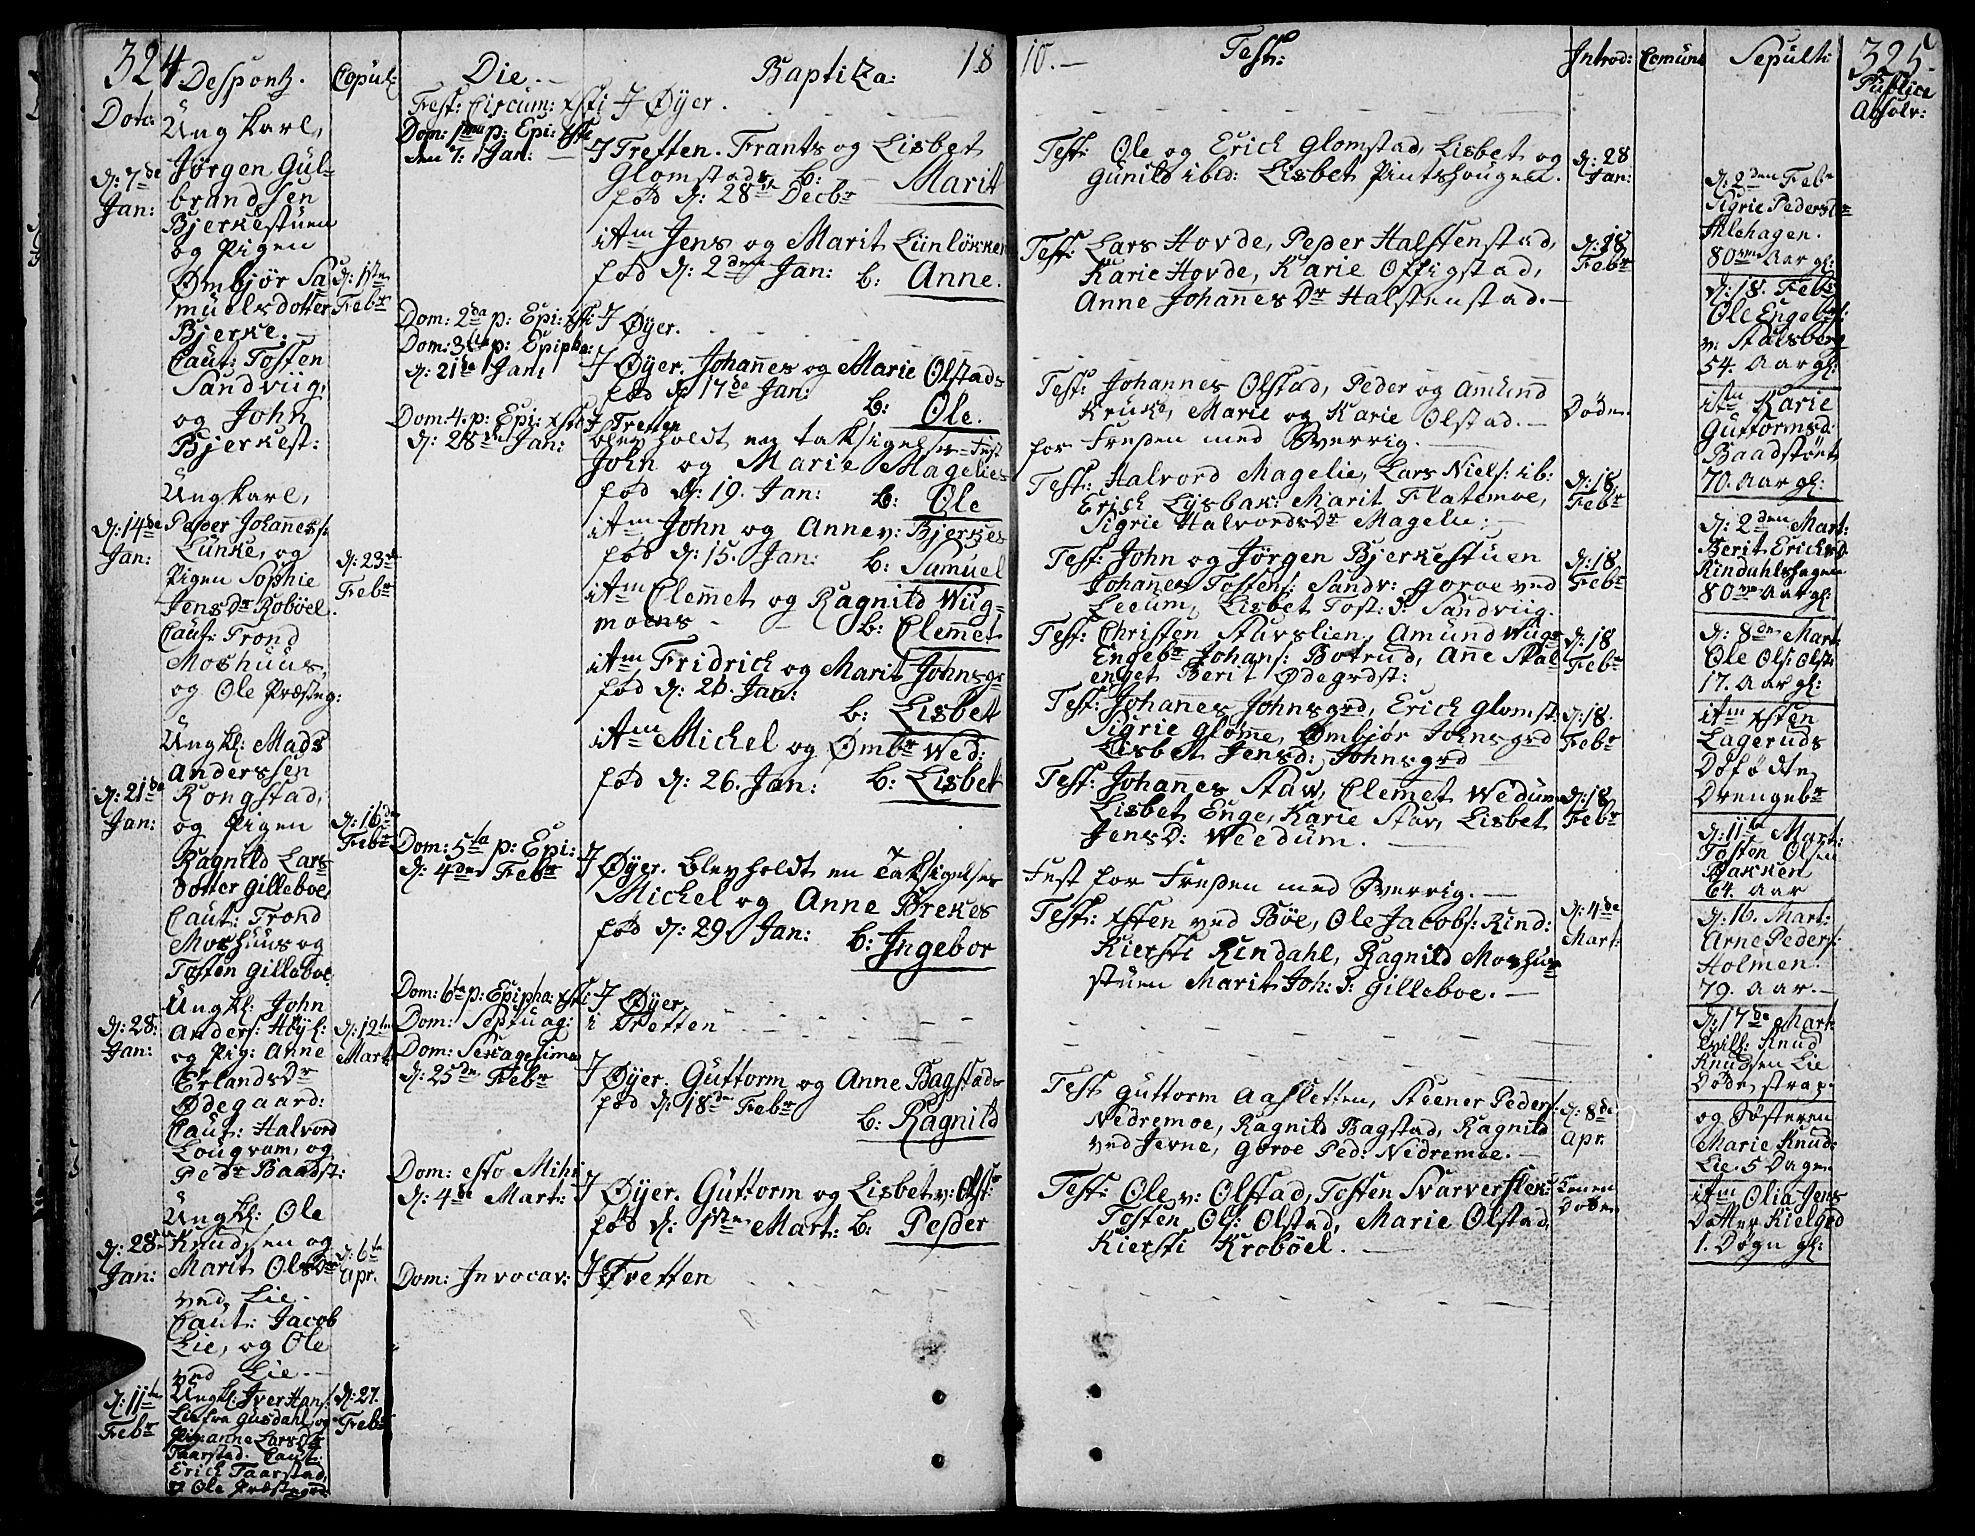 SAH, Øyer prestekontor, Ministerialbok nr. 3, 1784-1824, s. 324-325